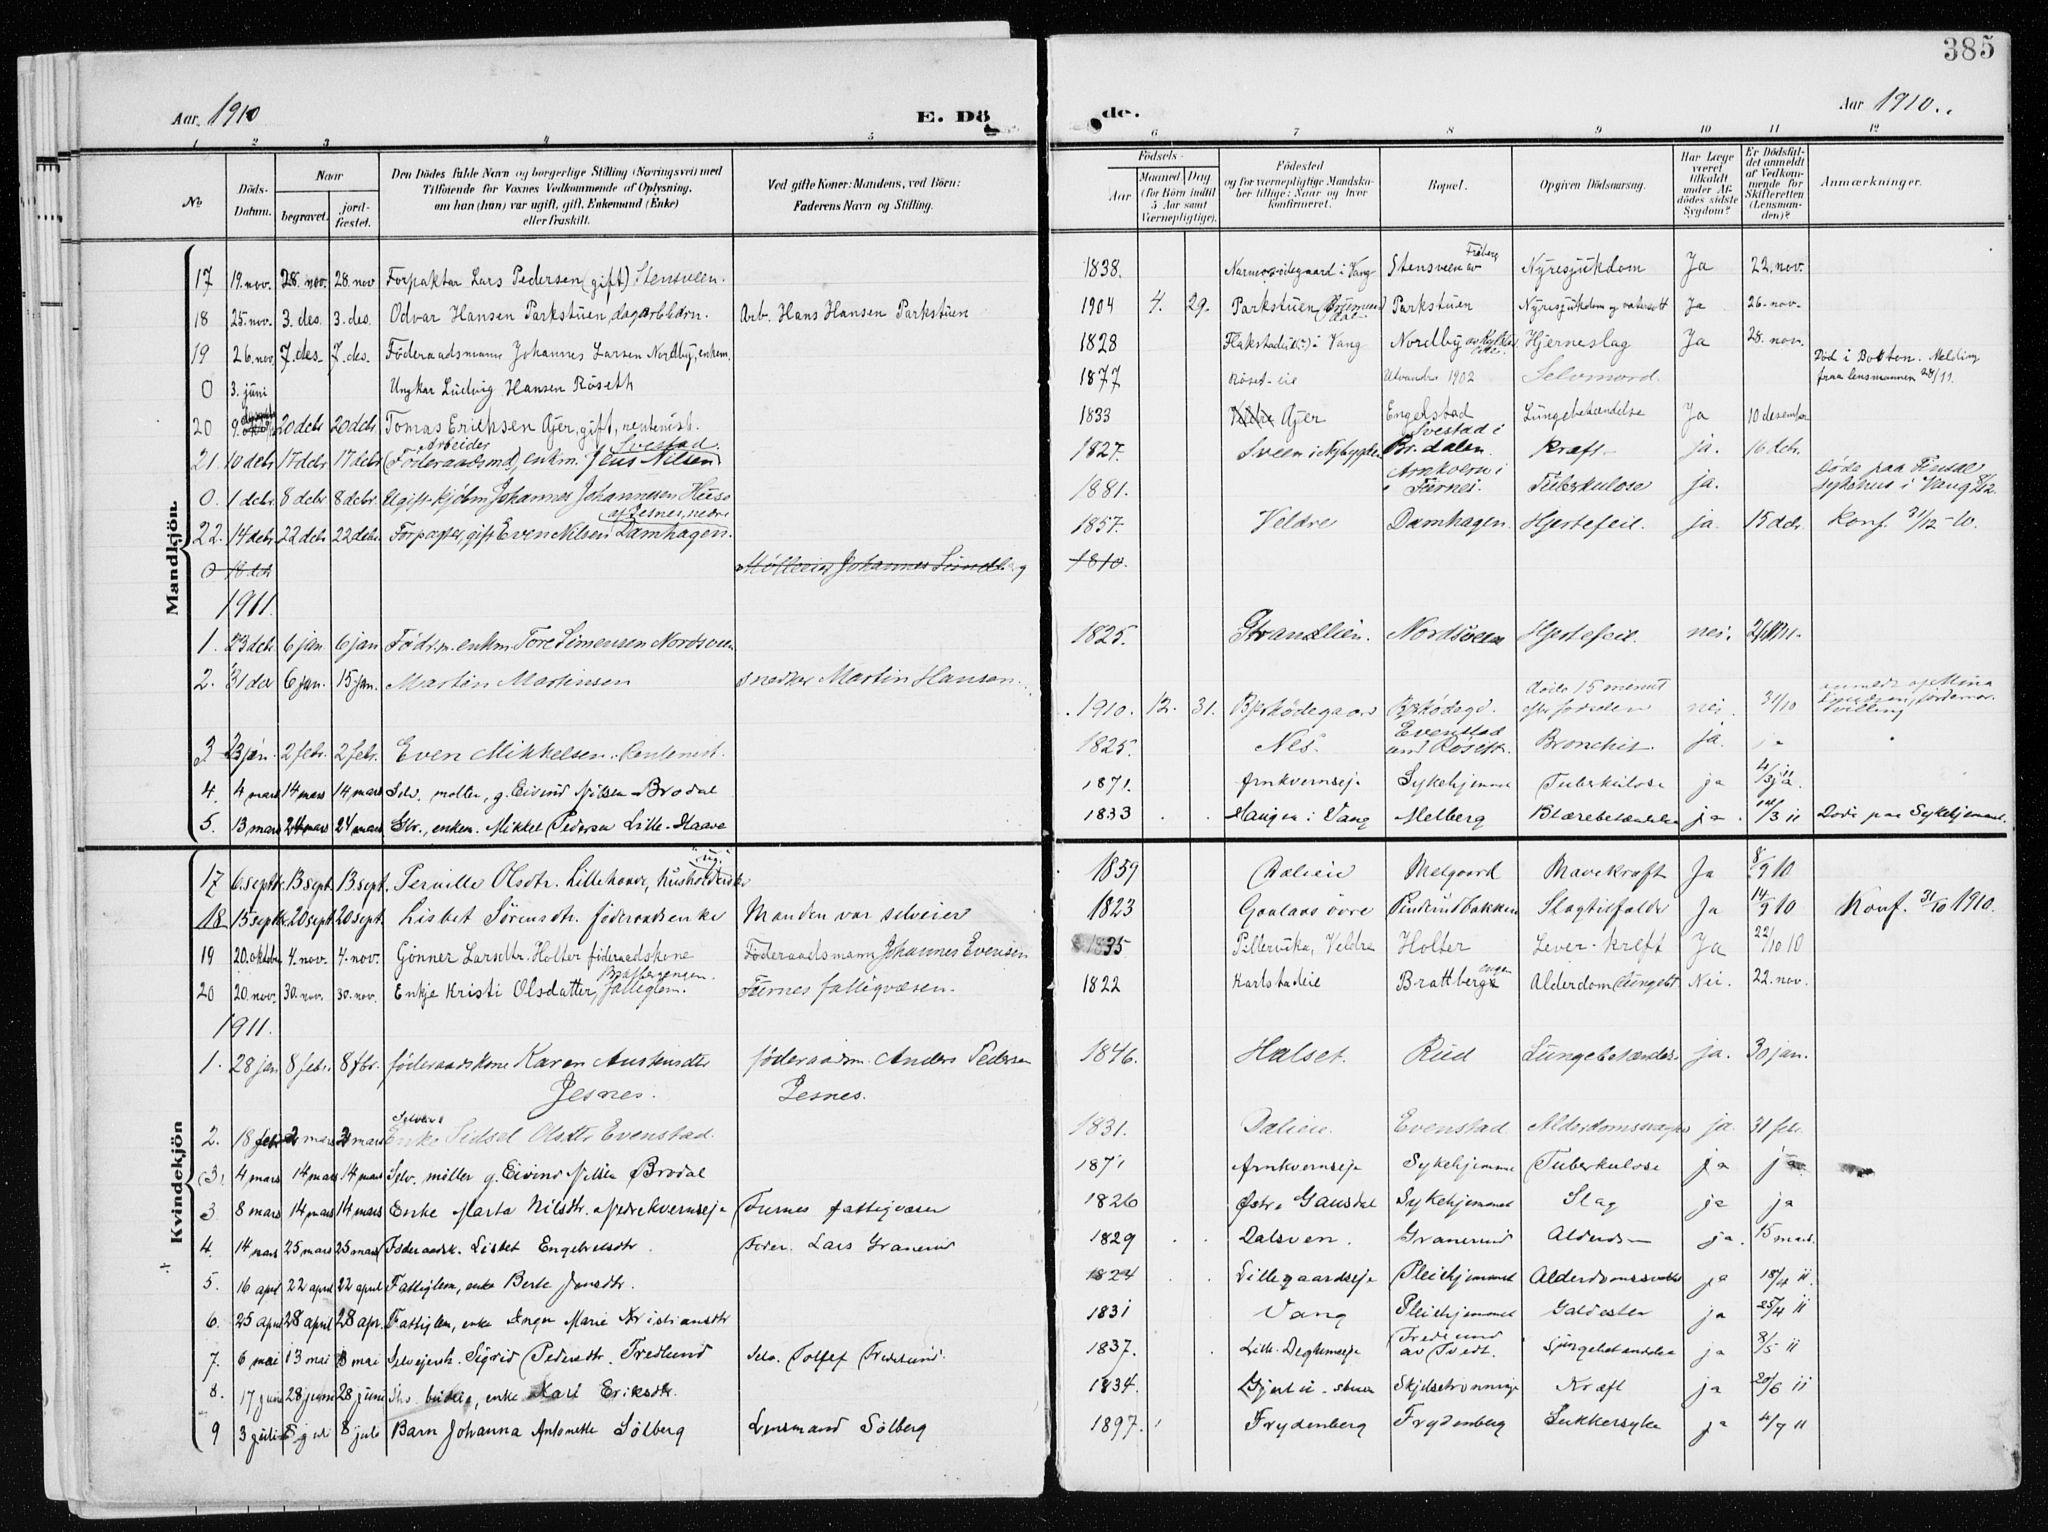 SAH, Furnes prestekontor, K/Ka/L0001: Ministerialbok nr. 1, 1907-1935, s. 385